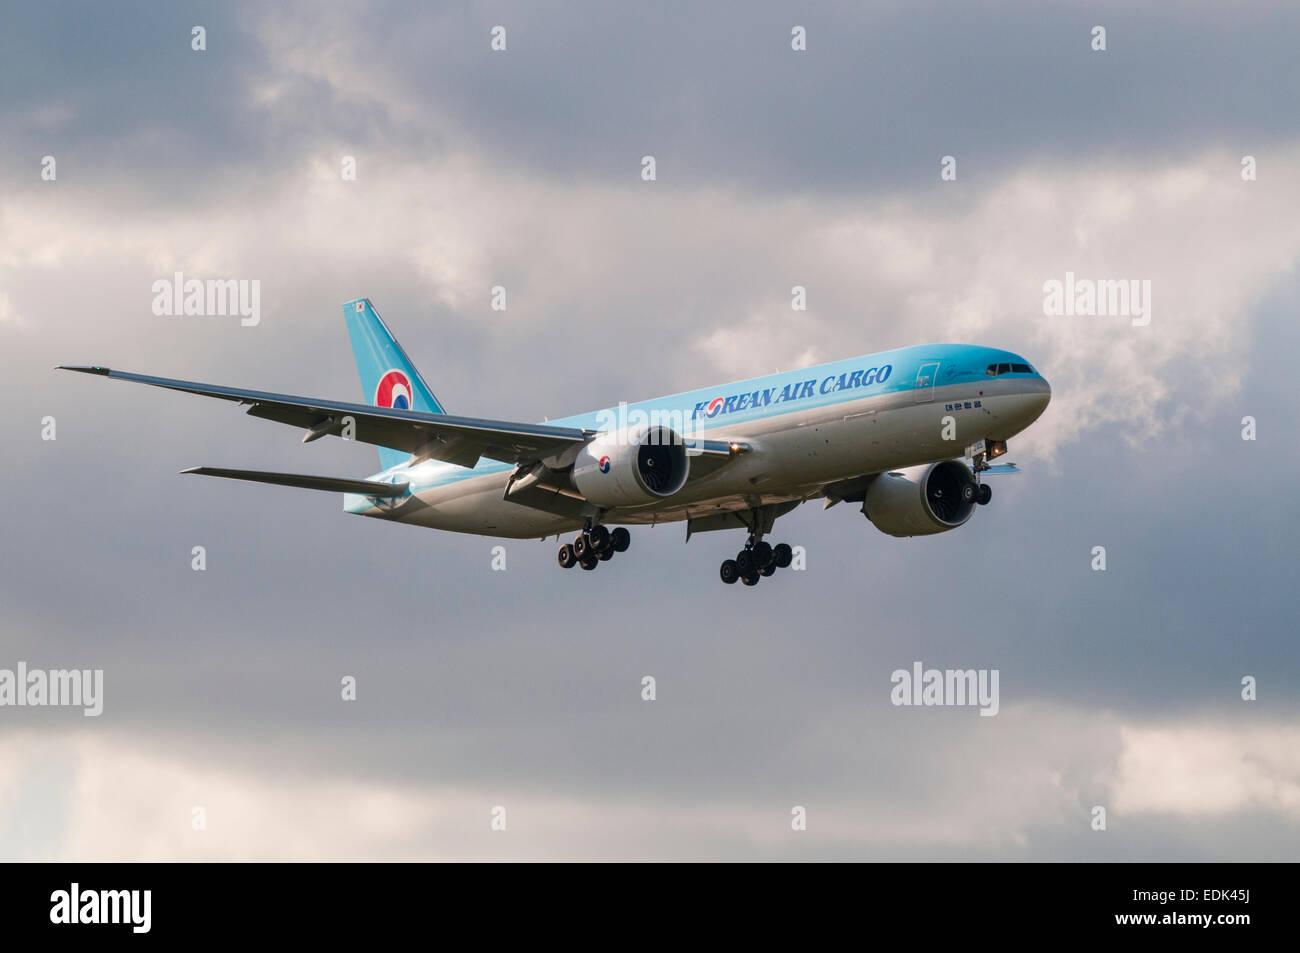 Korean Air Cargo Boeing 777 Freight Aeroplaneing In To Land